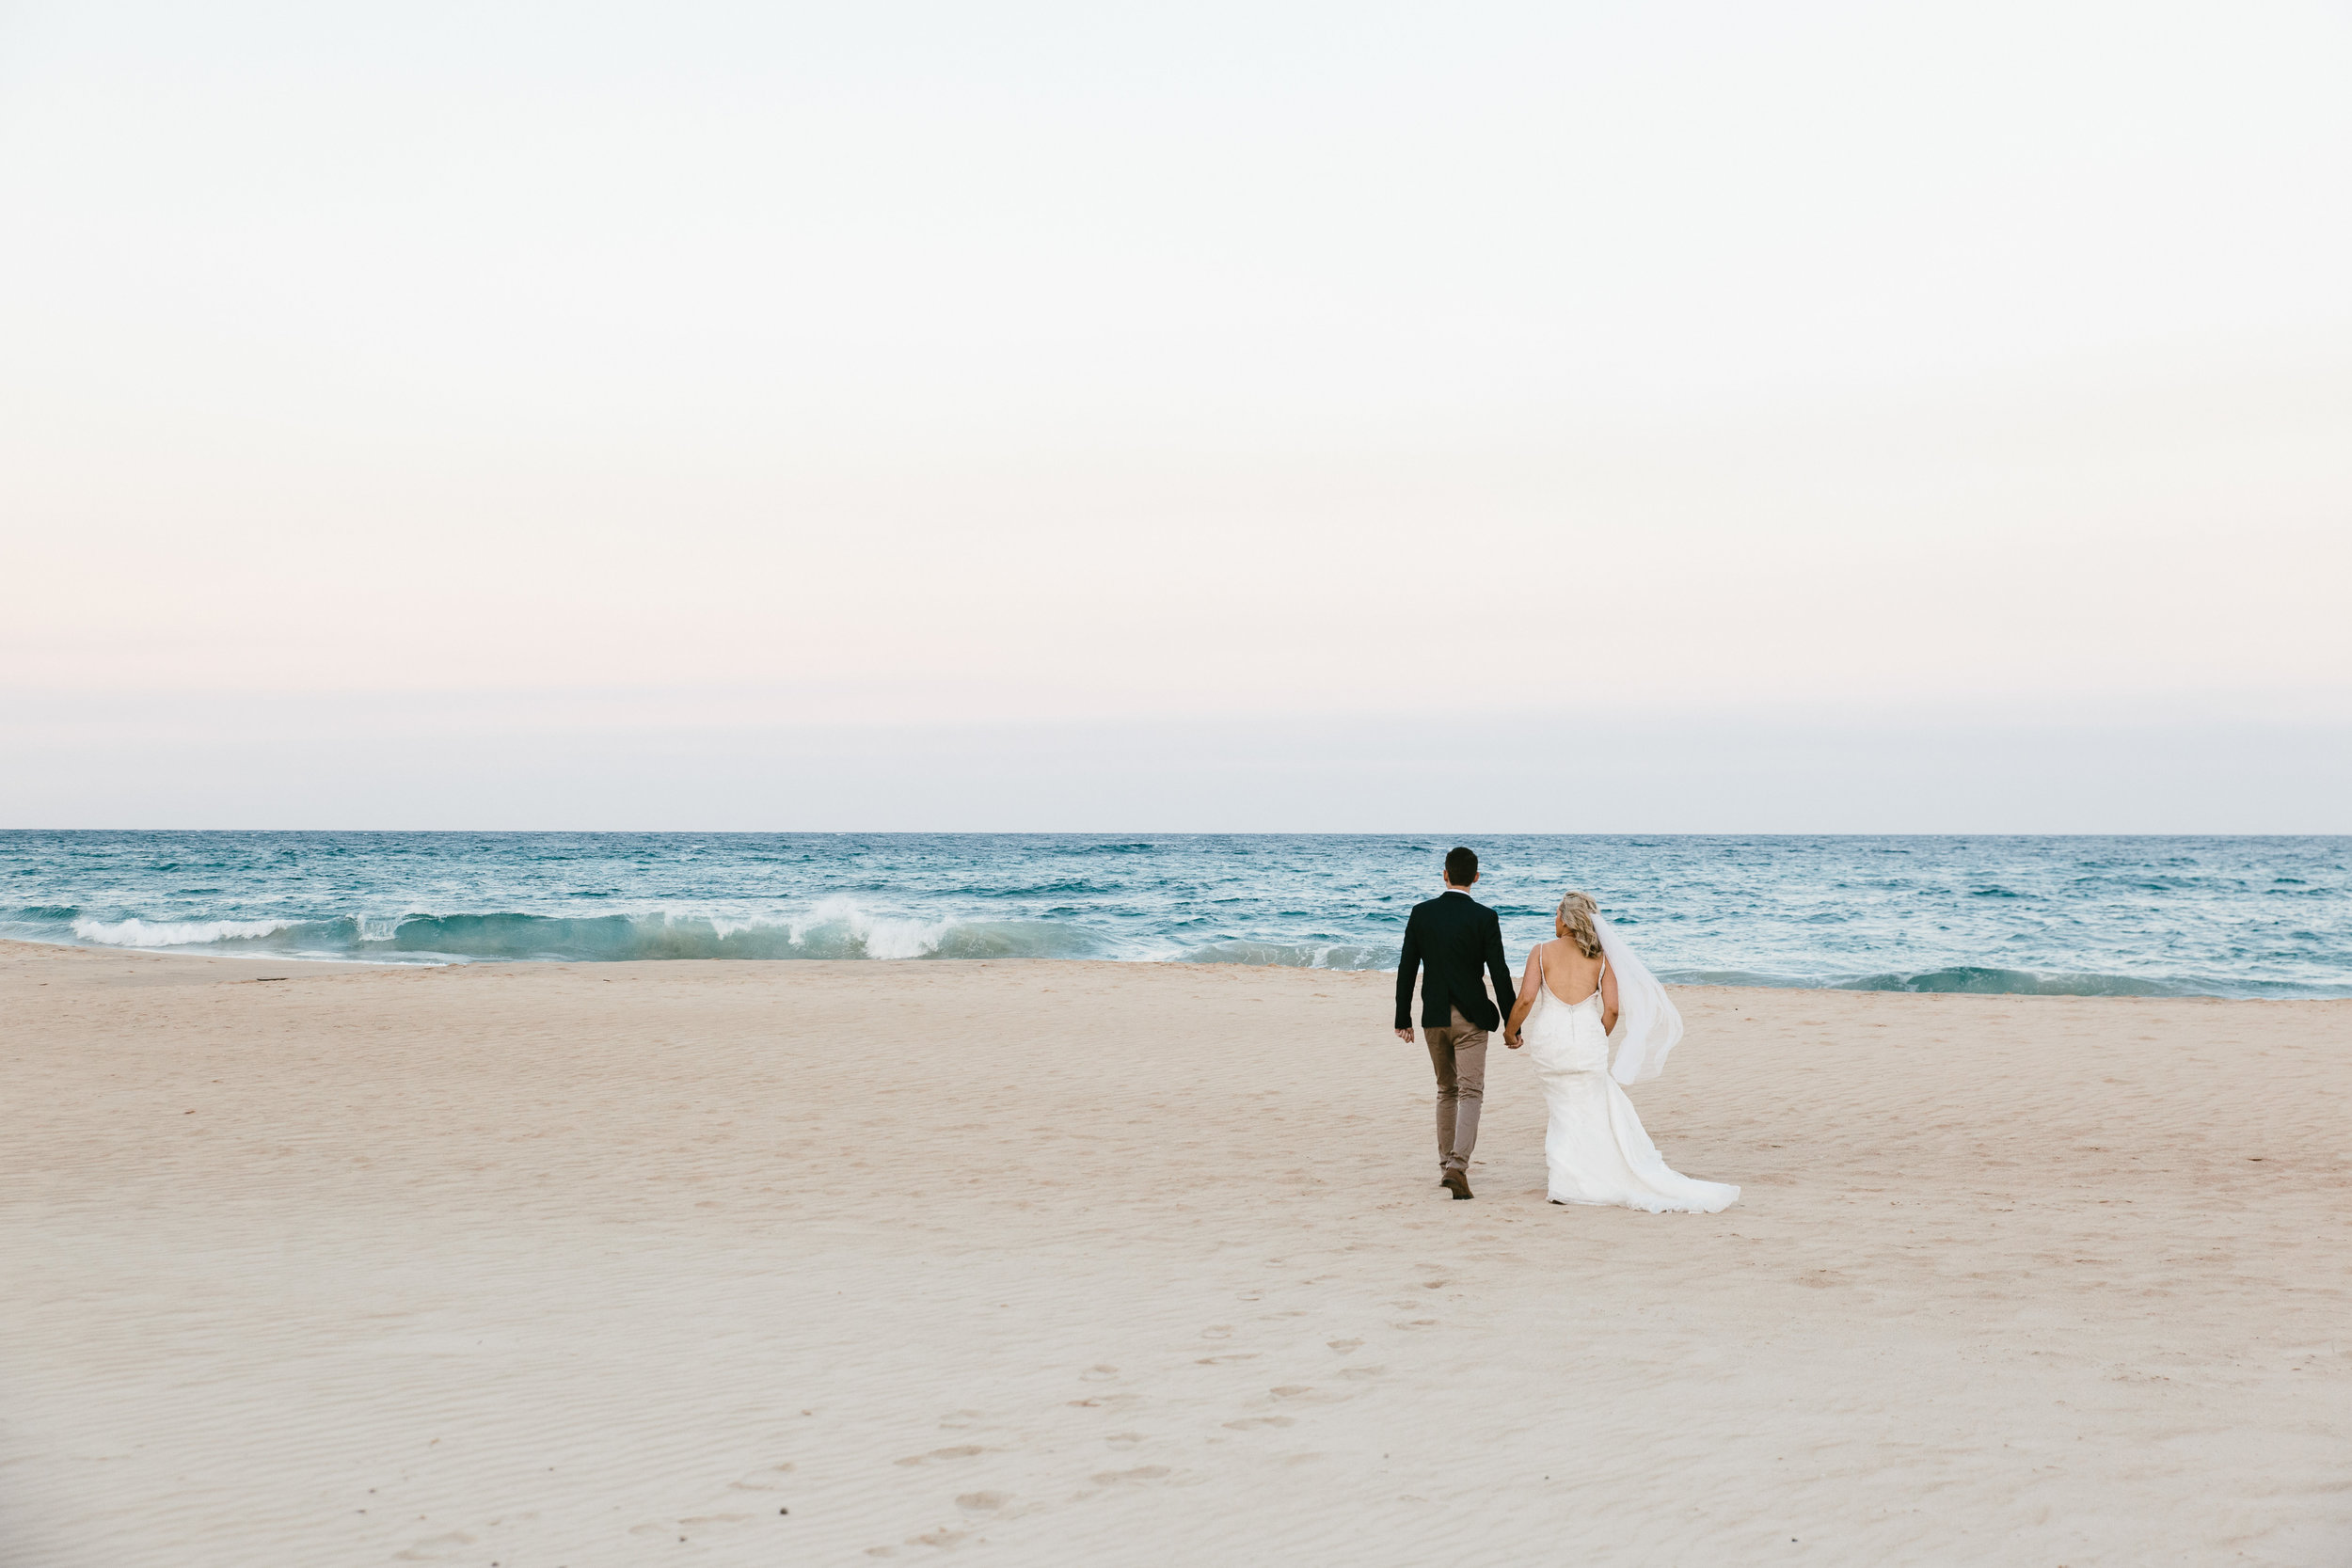 sunshine-coast-wedding-photography-65.jpg